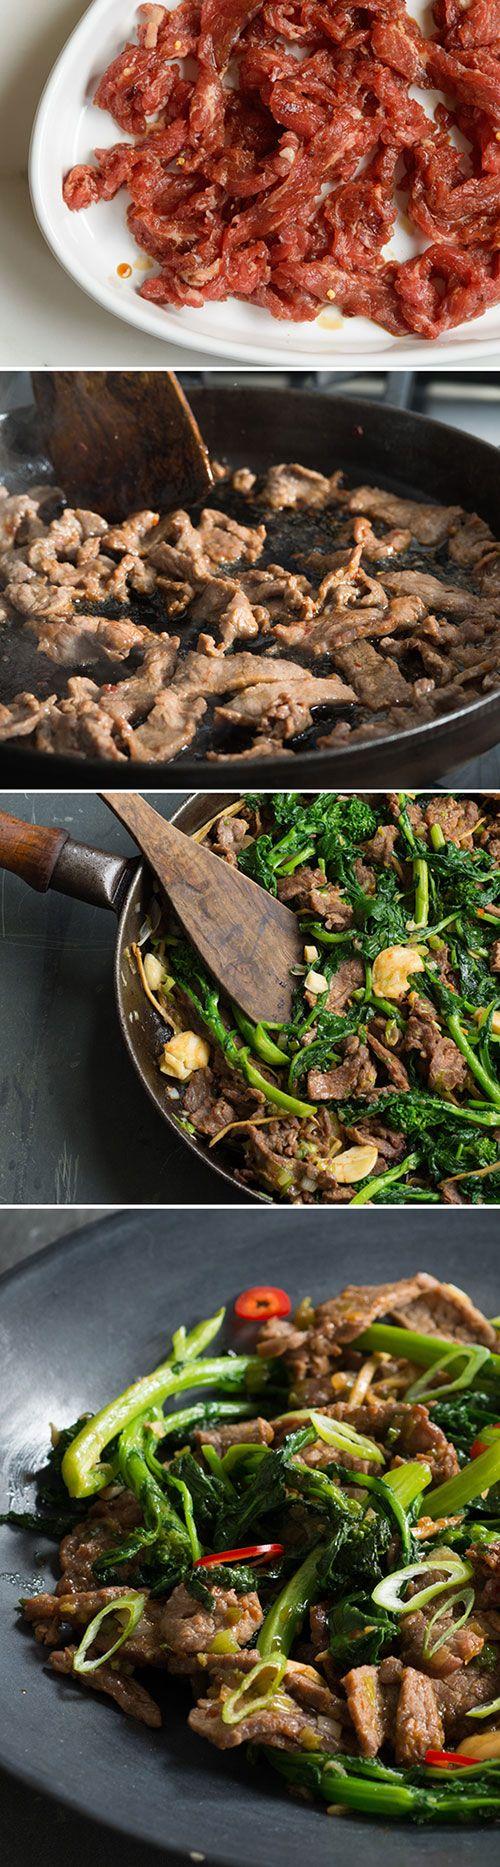 Beef and Broccoli Rabe Stir Fry Recipe